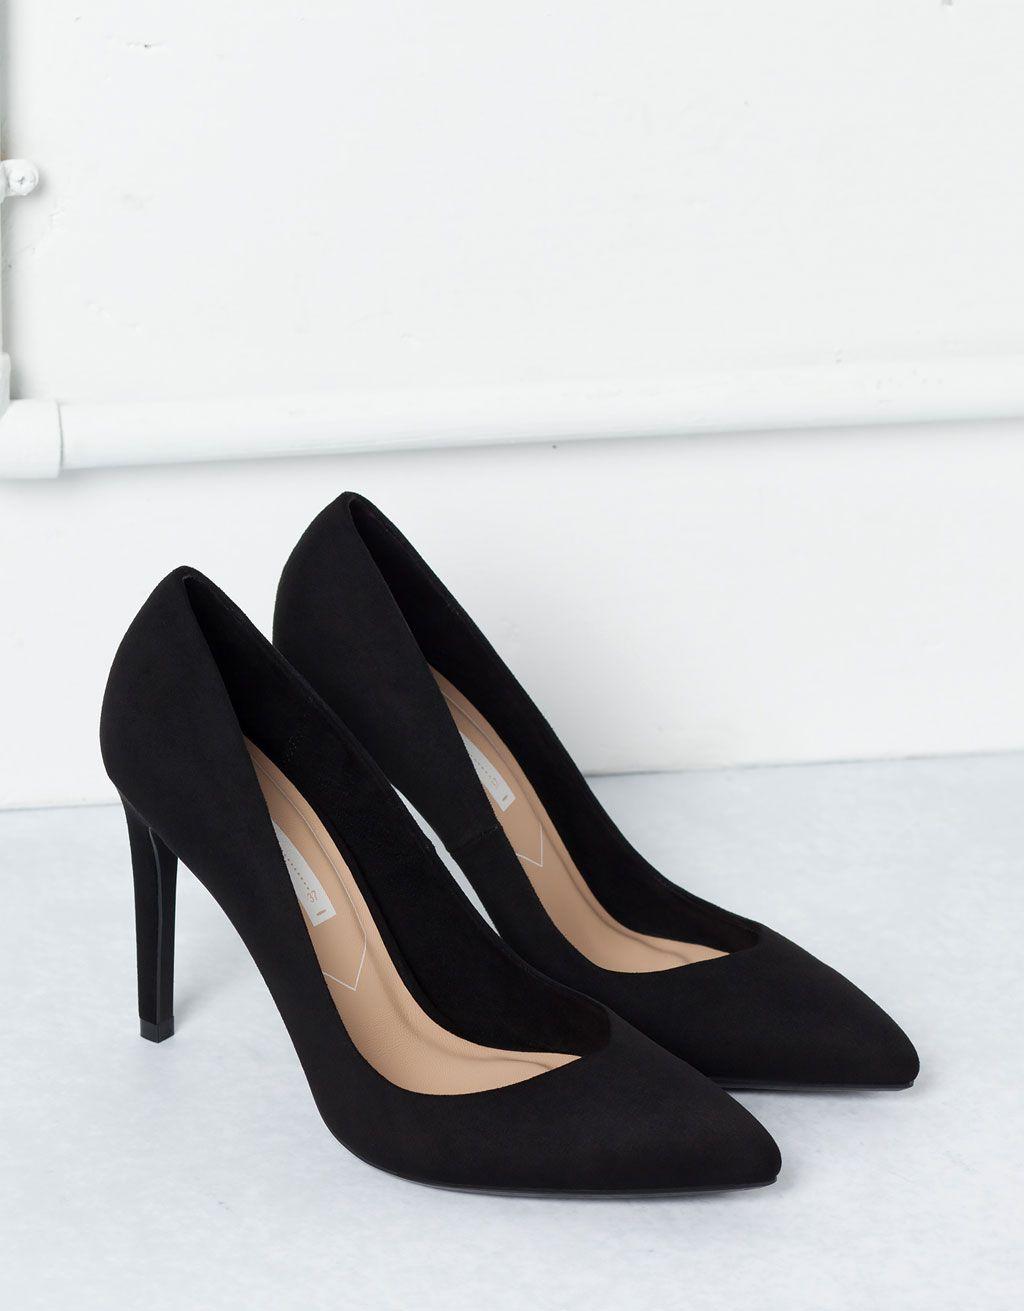 Szpilki Bershka Basic Buty Bershka Poland Stiletto Heels Shoes